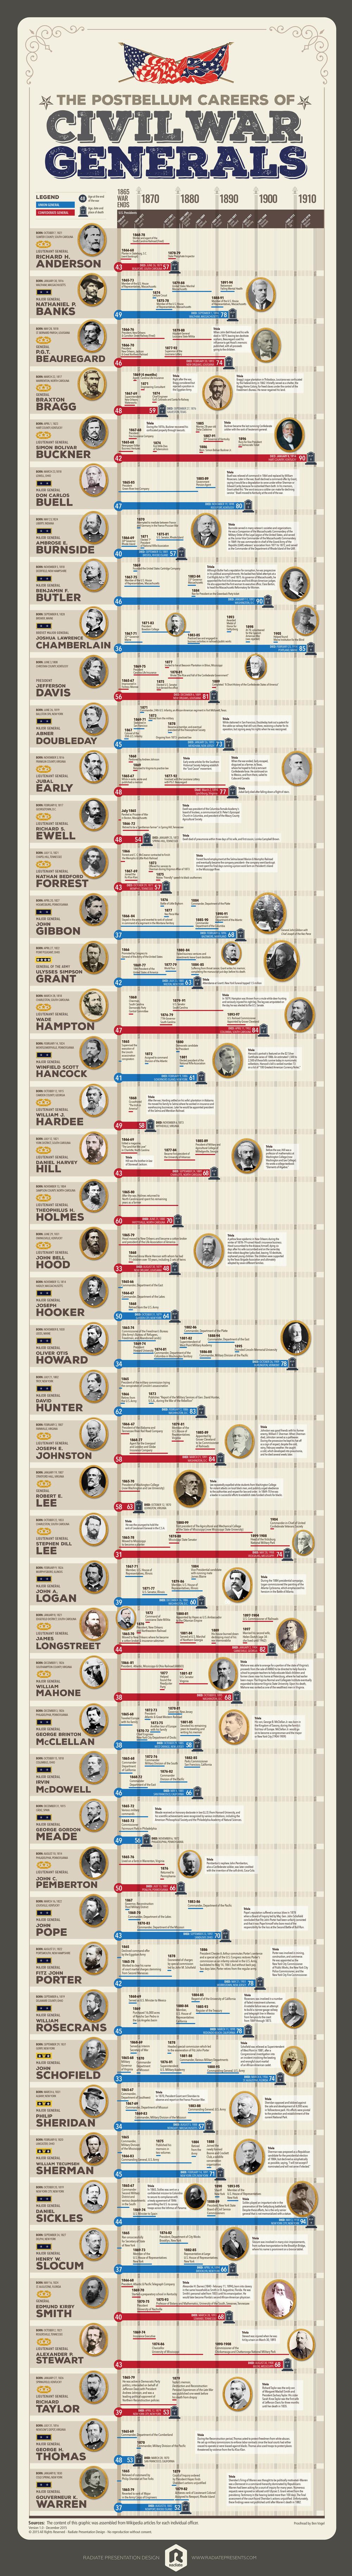 Postbellum Lives Infographic_2500px-01.jpg